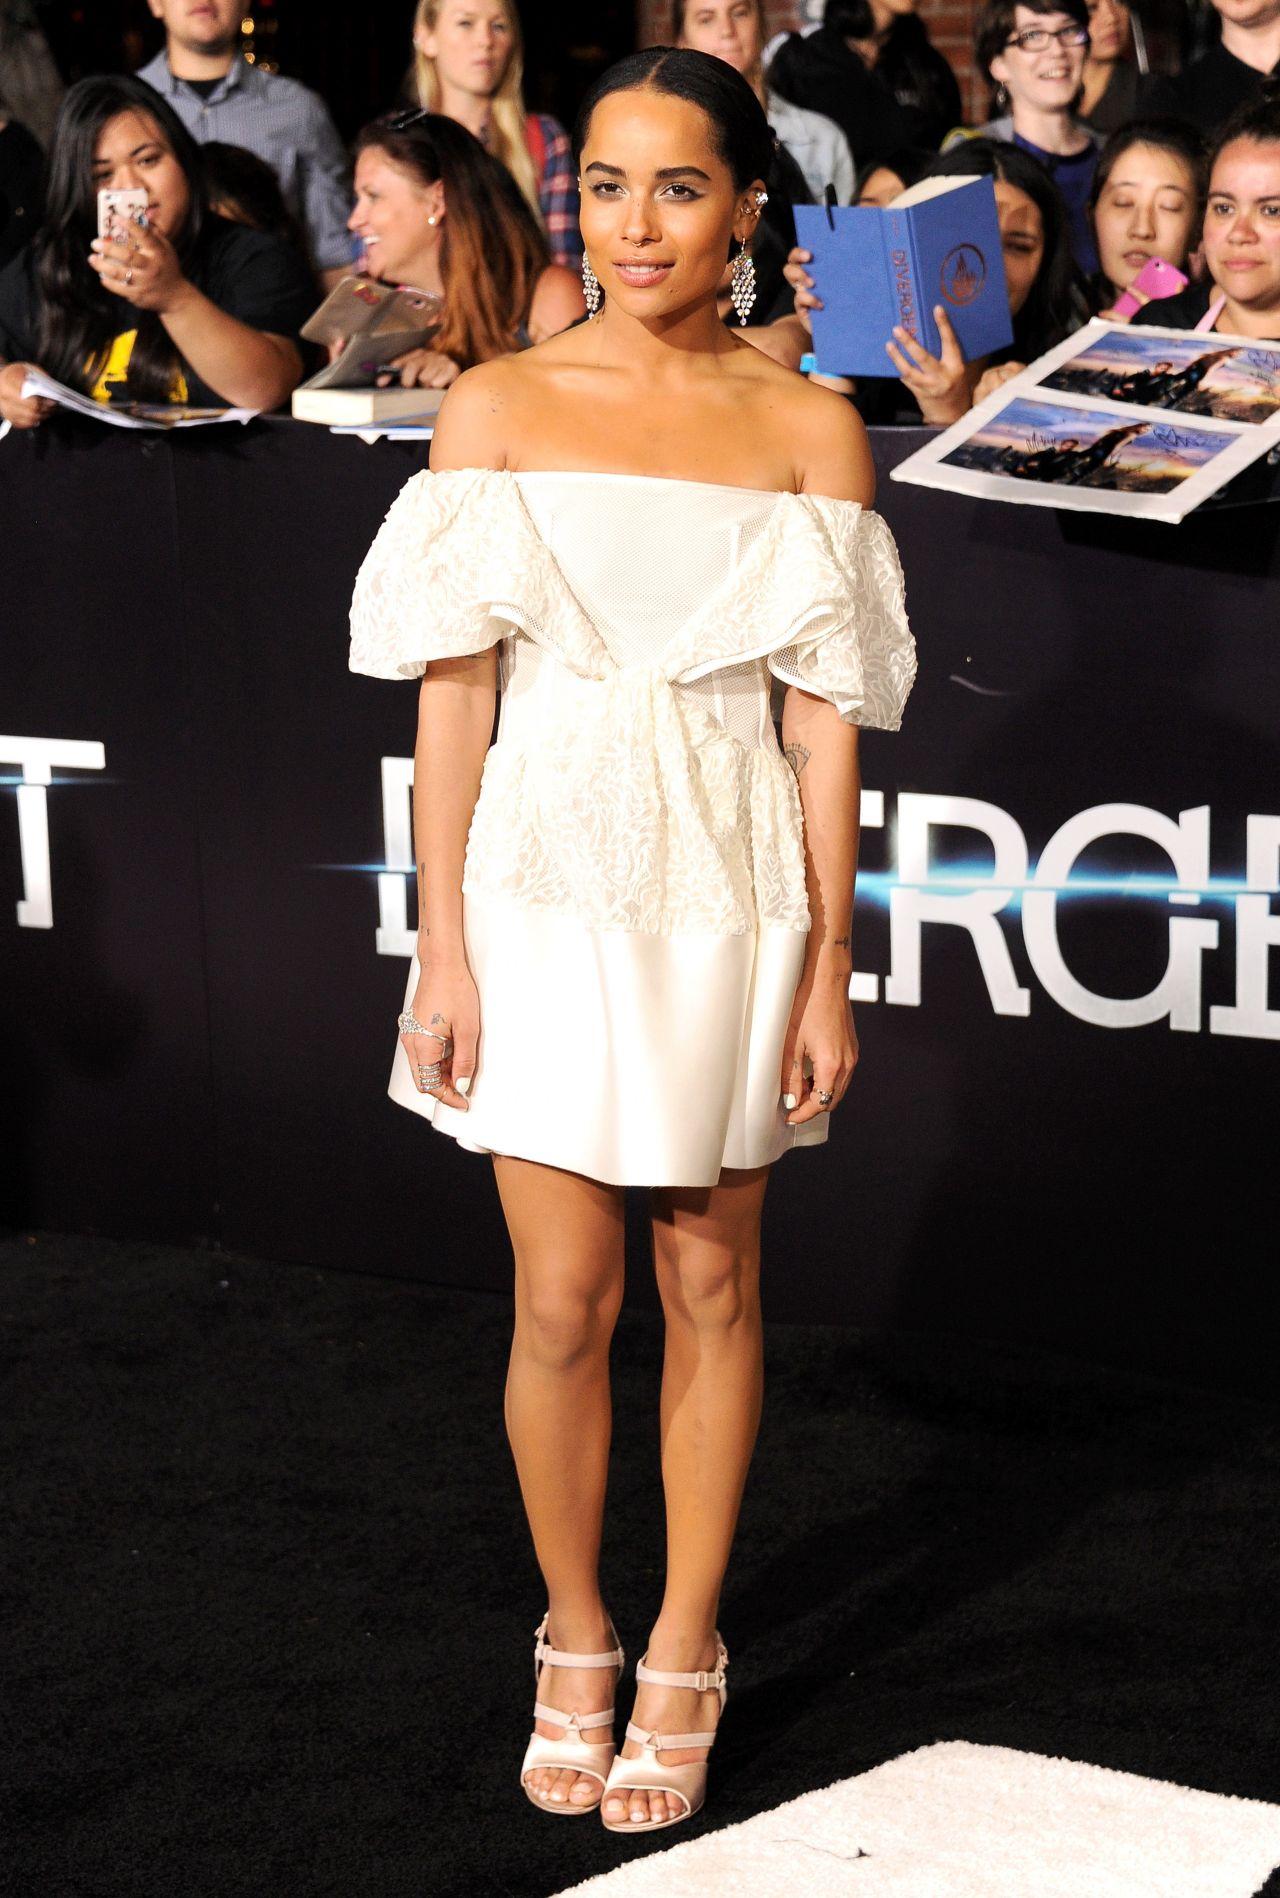 Zoe Kravitz Wearing Balenciaga White Mini Dress At